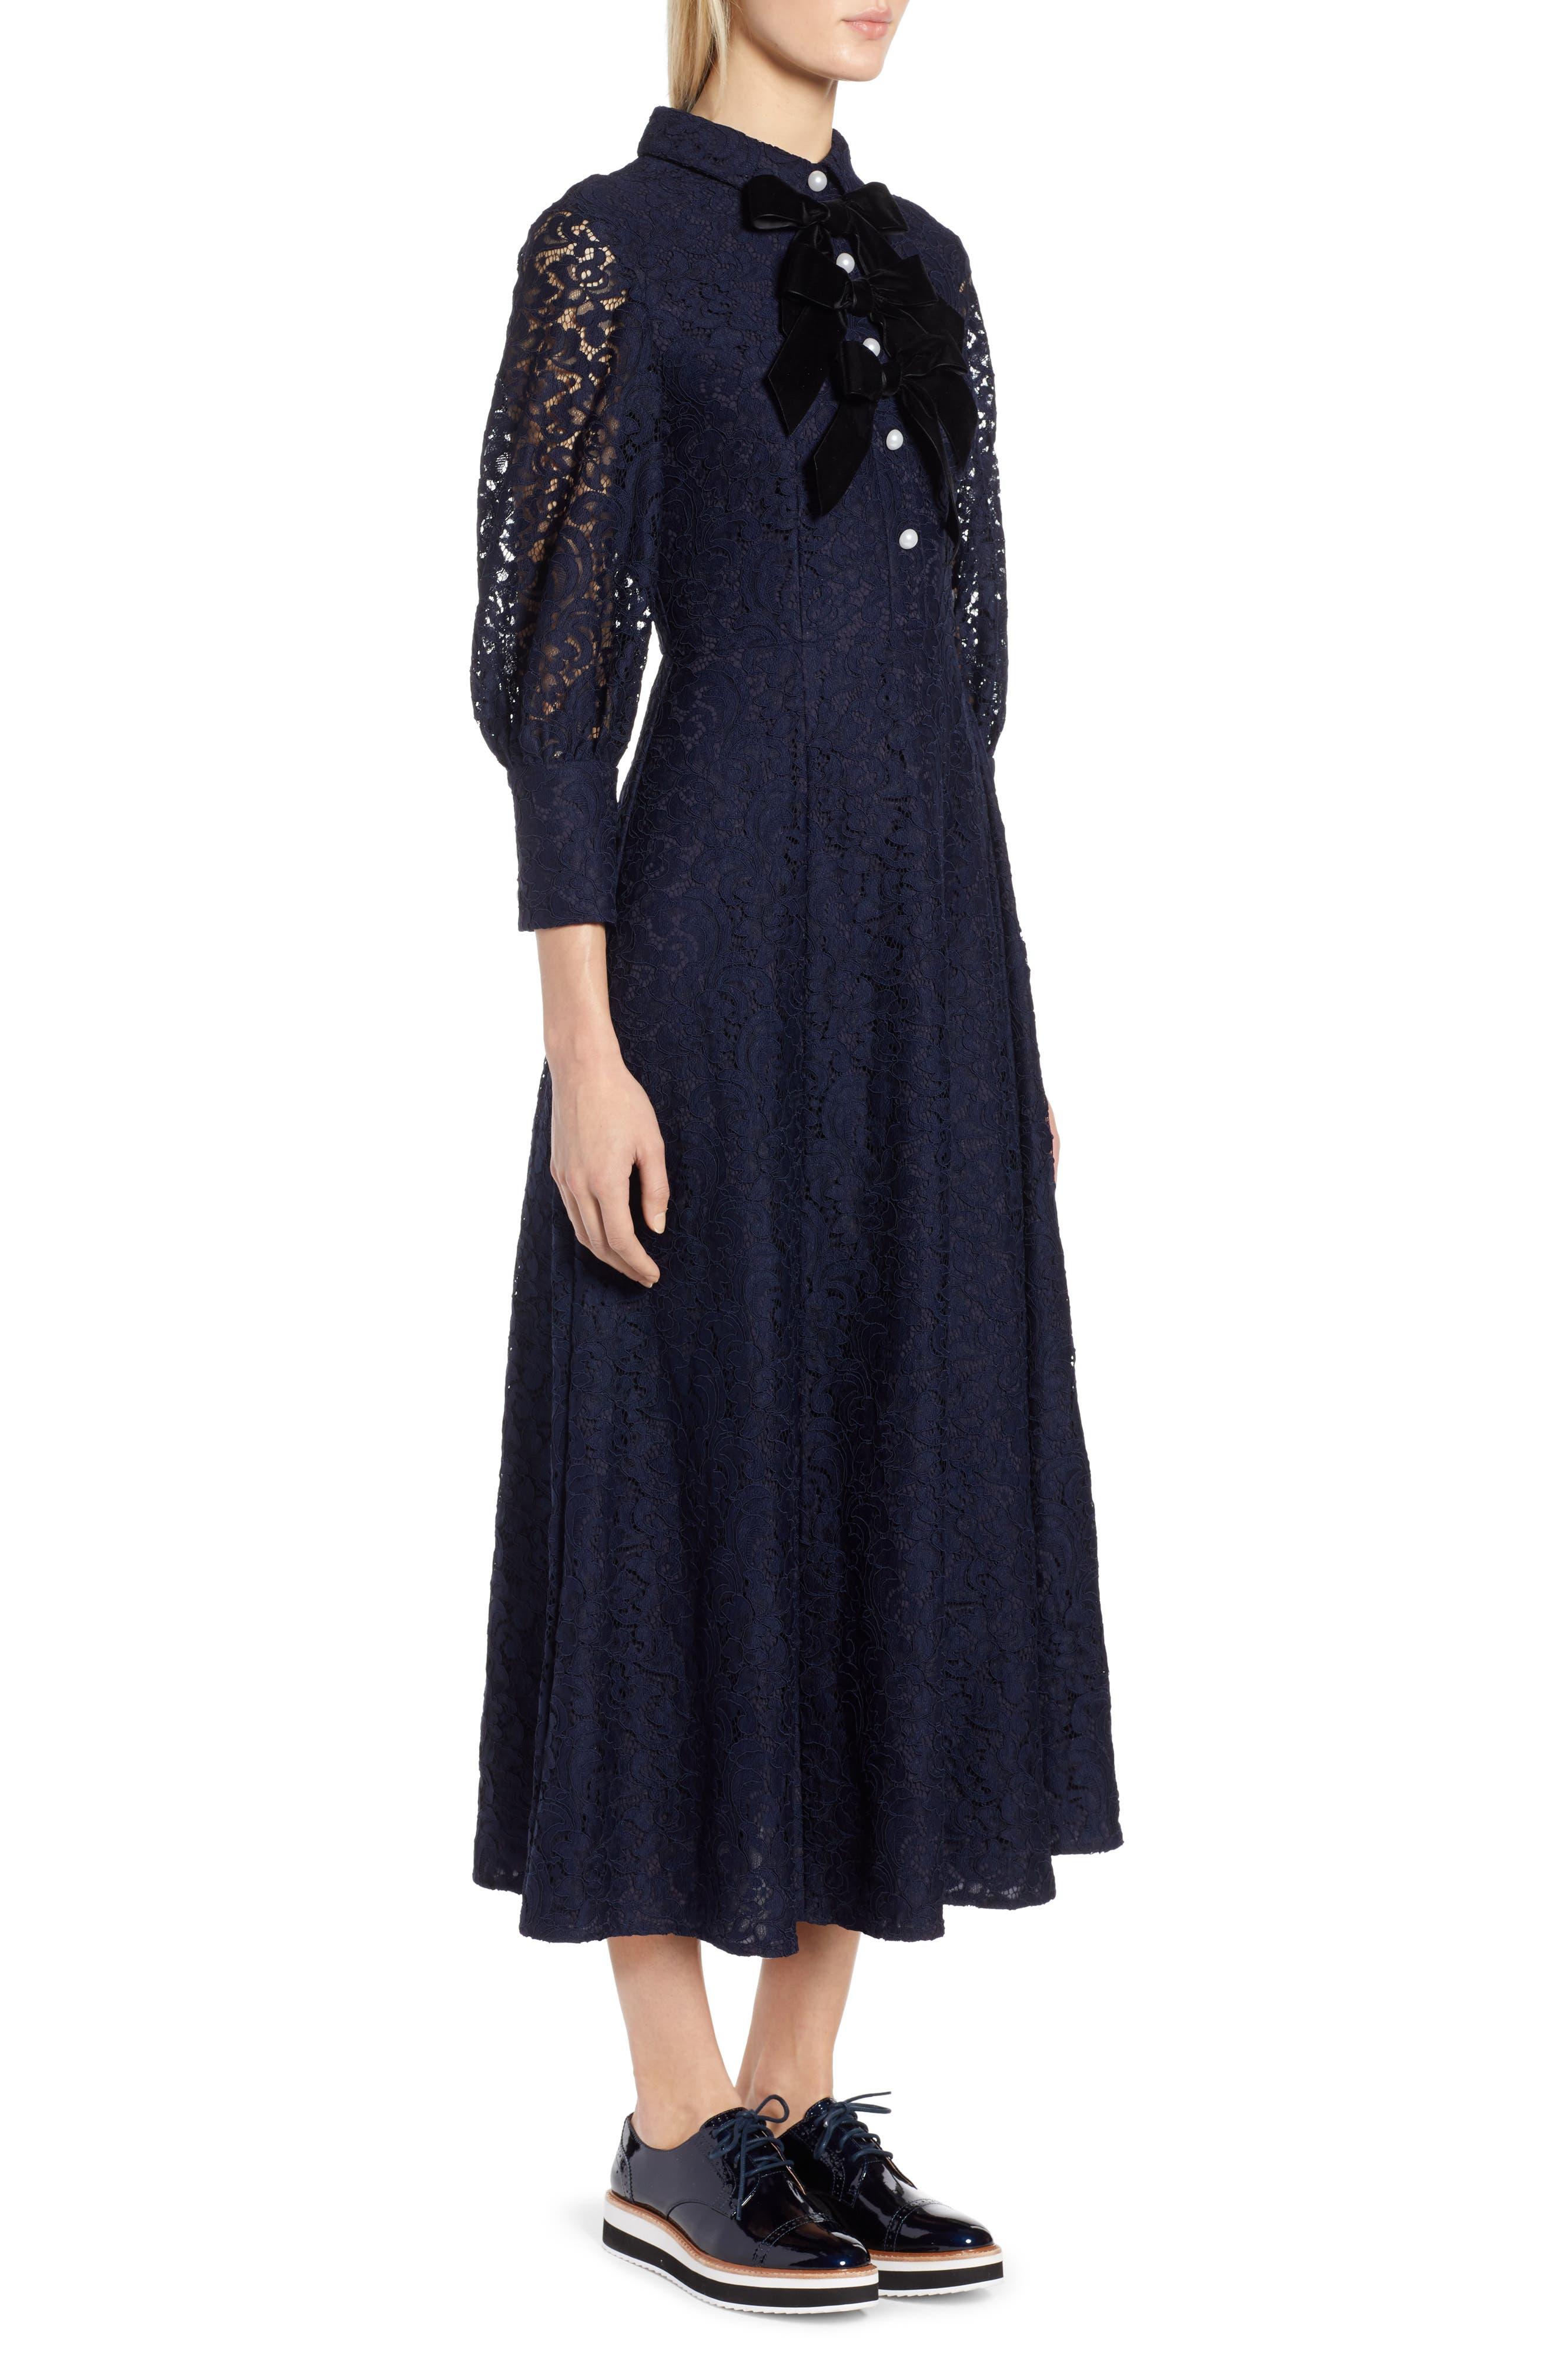 x Atlantic-Pacific Bow Detail Lace Midi Dress,                             Alternate thumbnail 4, color,                             NAVY